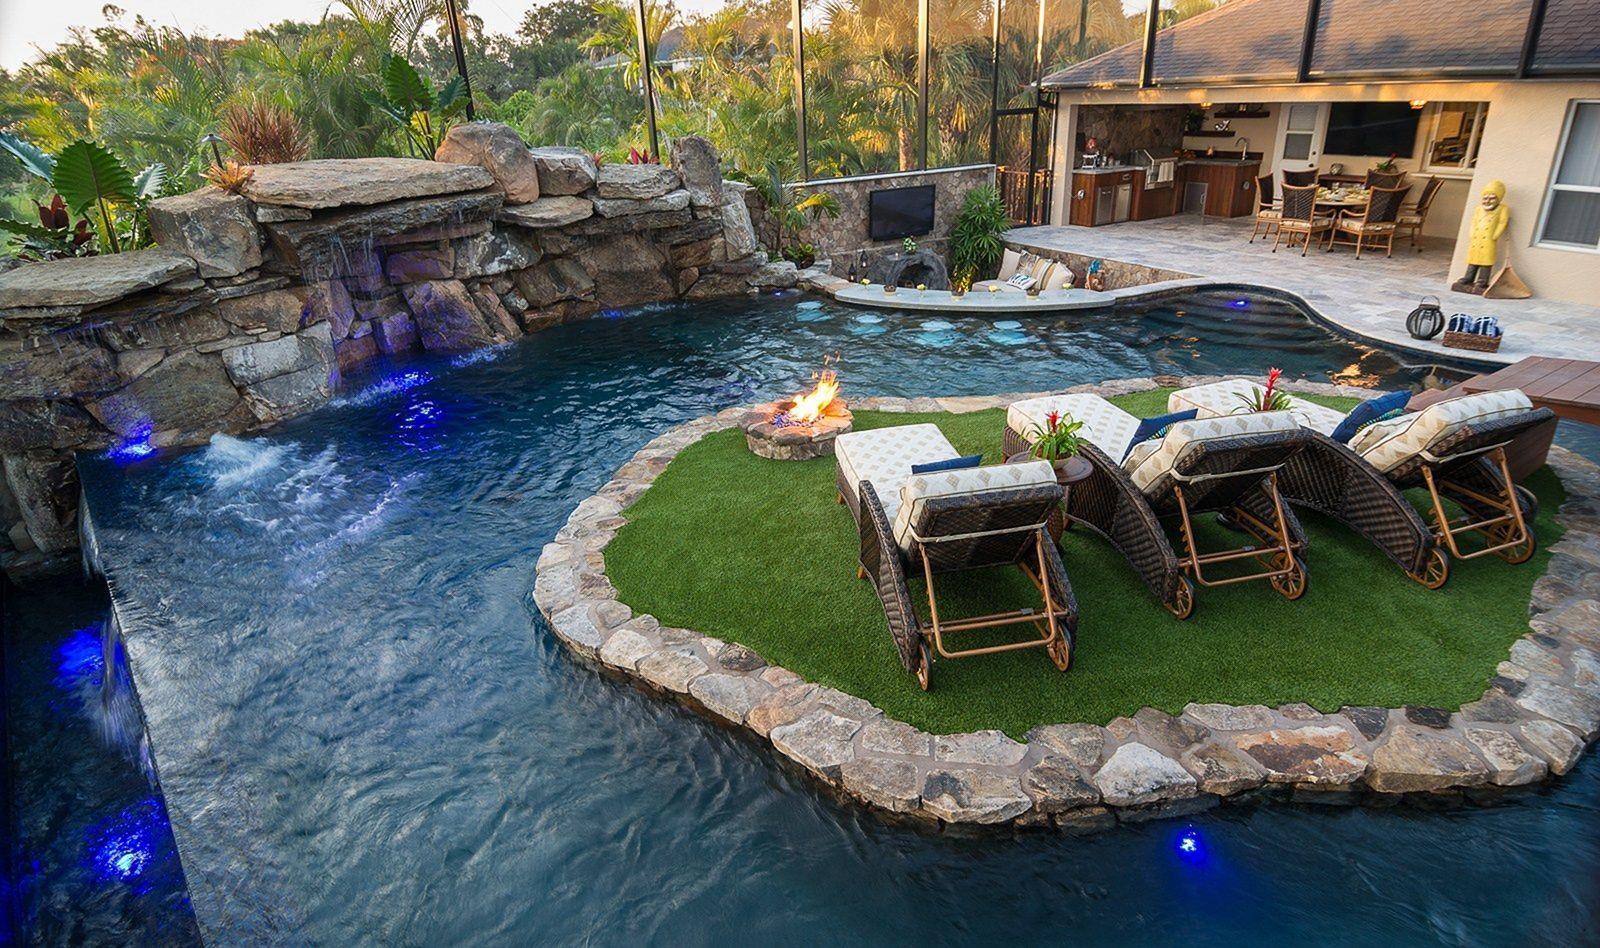 Inspiring Gorgeous 25 Insane Pool Design Ideas For Your Home Https Decoredo Com 20903 Gorgeous 25 Insane Pool Design I Luxury Pools Pool Houses Backyard Pool